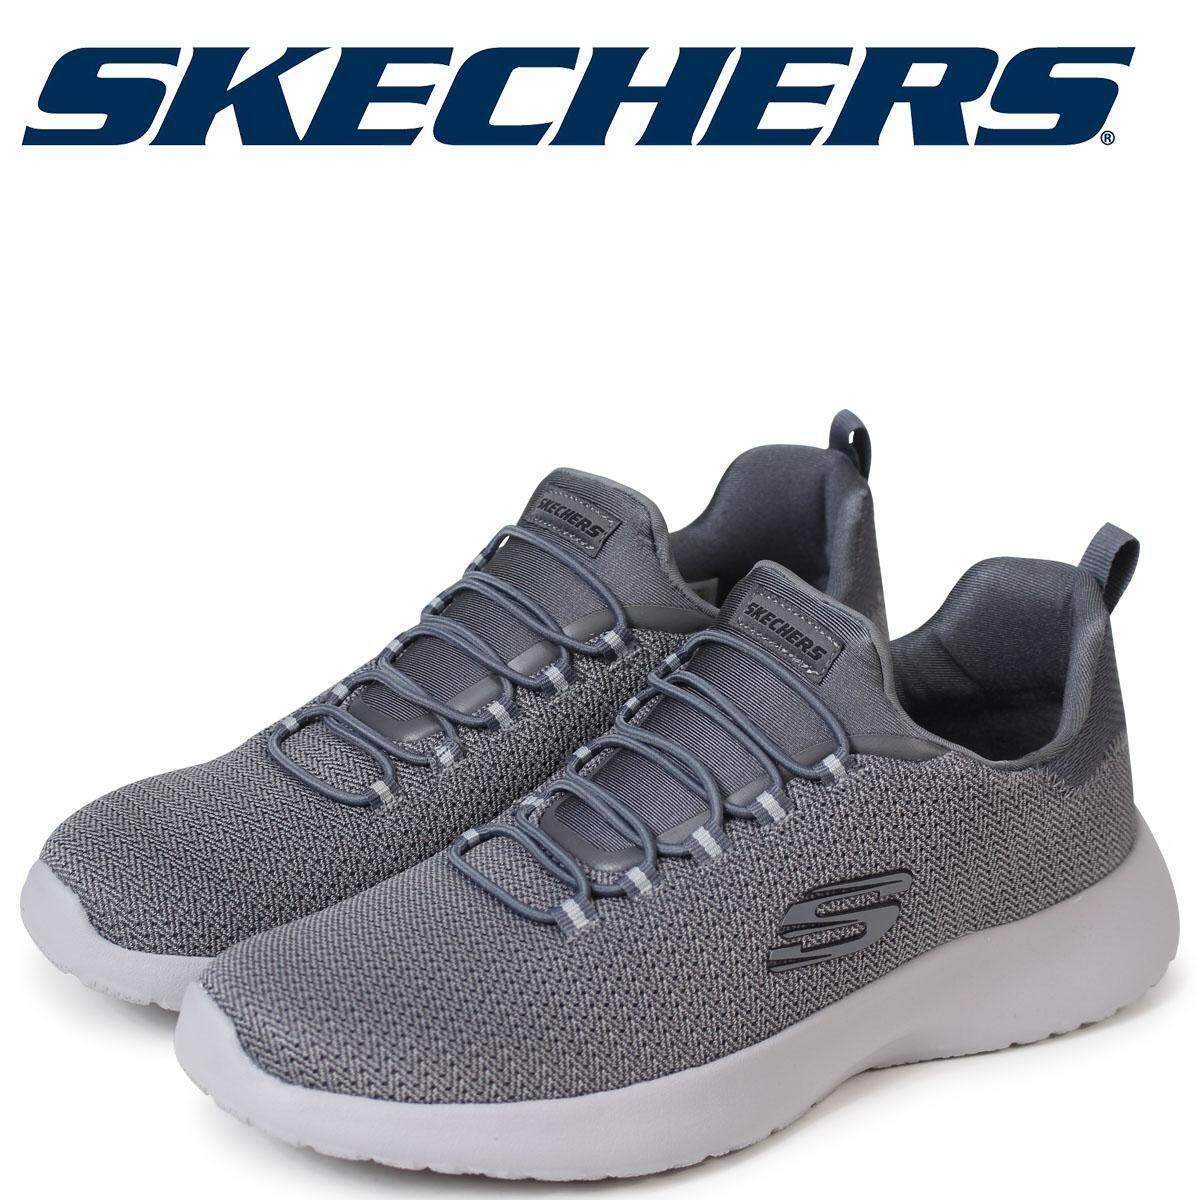 SKECHERS MEN รองเท้าผ้าใบ ผู้ชาย รุ่น DYNAMIGHT  - 58360CHAR (CHARCOAL)